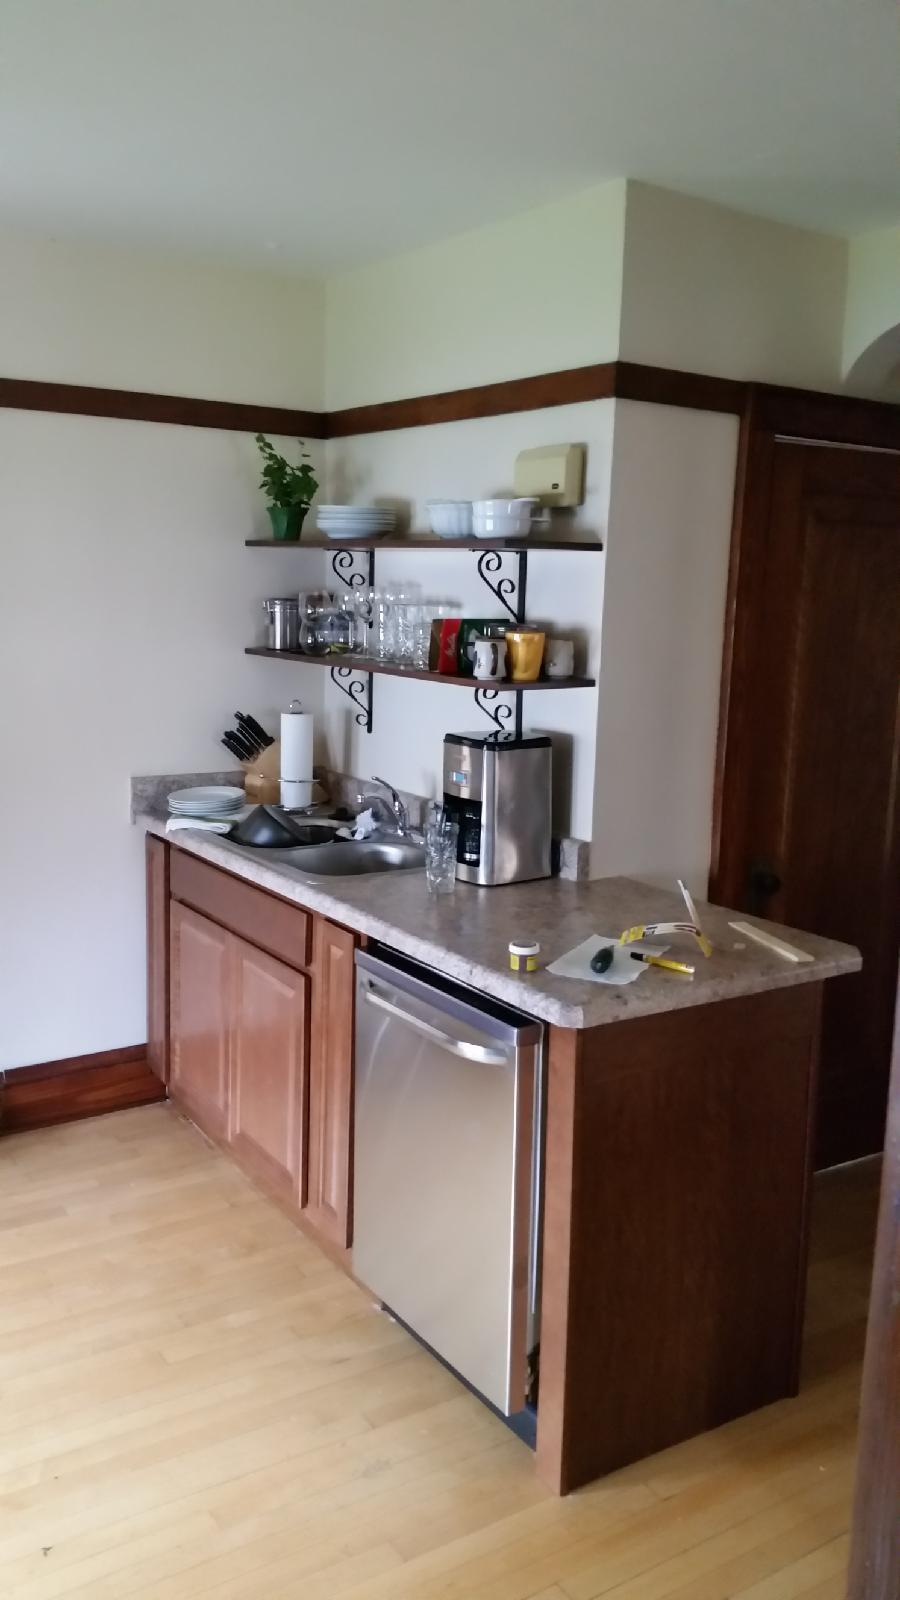 Enjoyable Custom Cabinets Vdb Contractors Download Free Architecture Designs Intelgarnamadebymaigaardcom